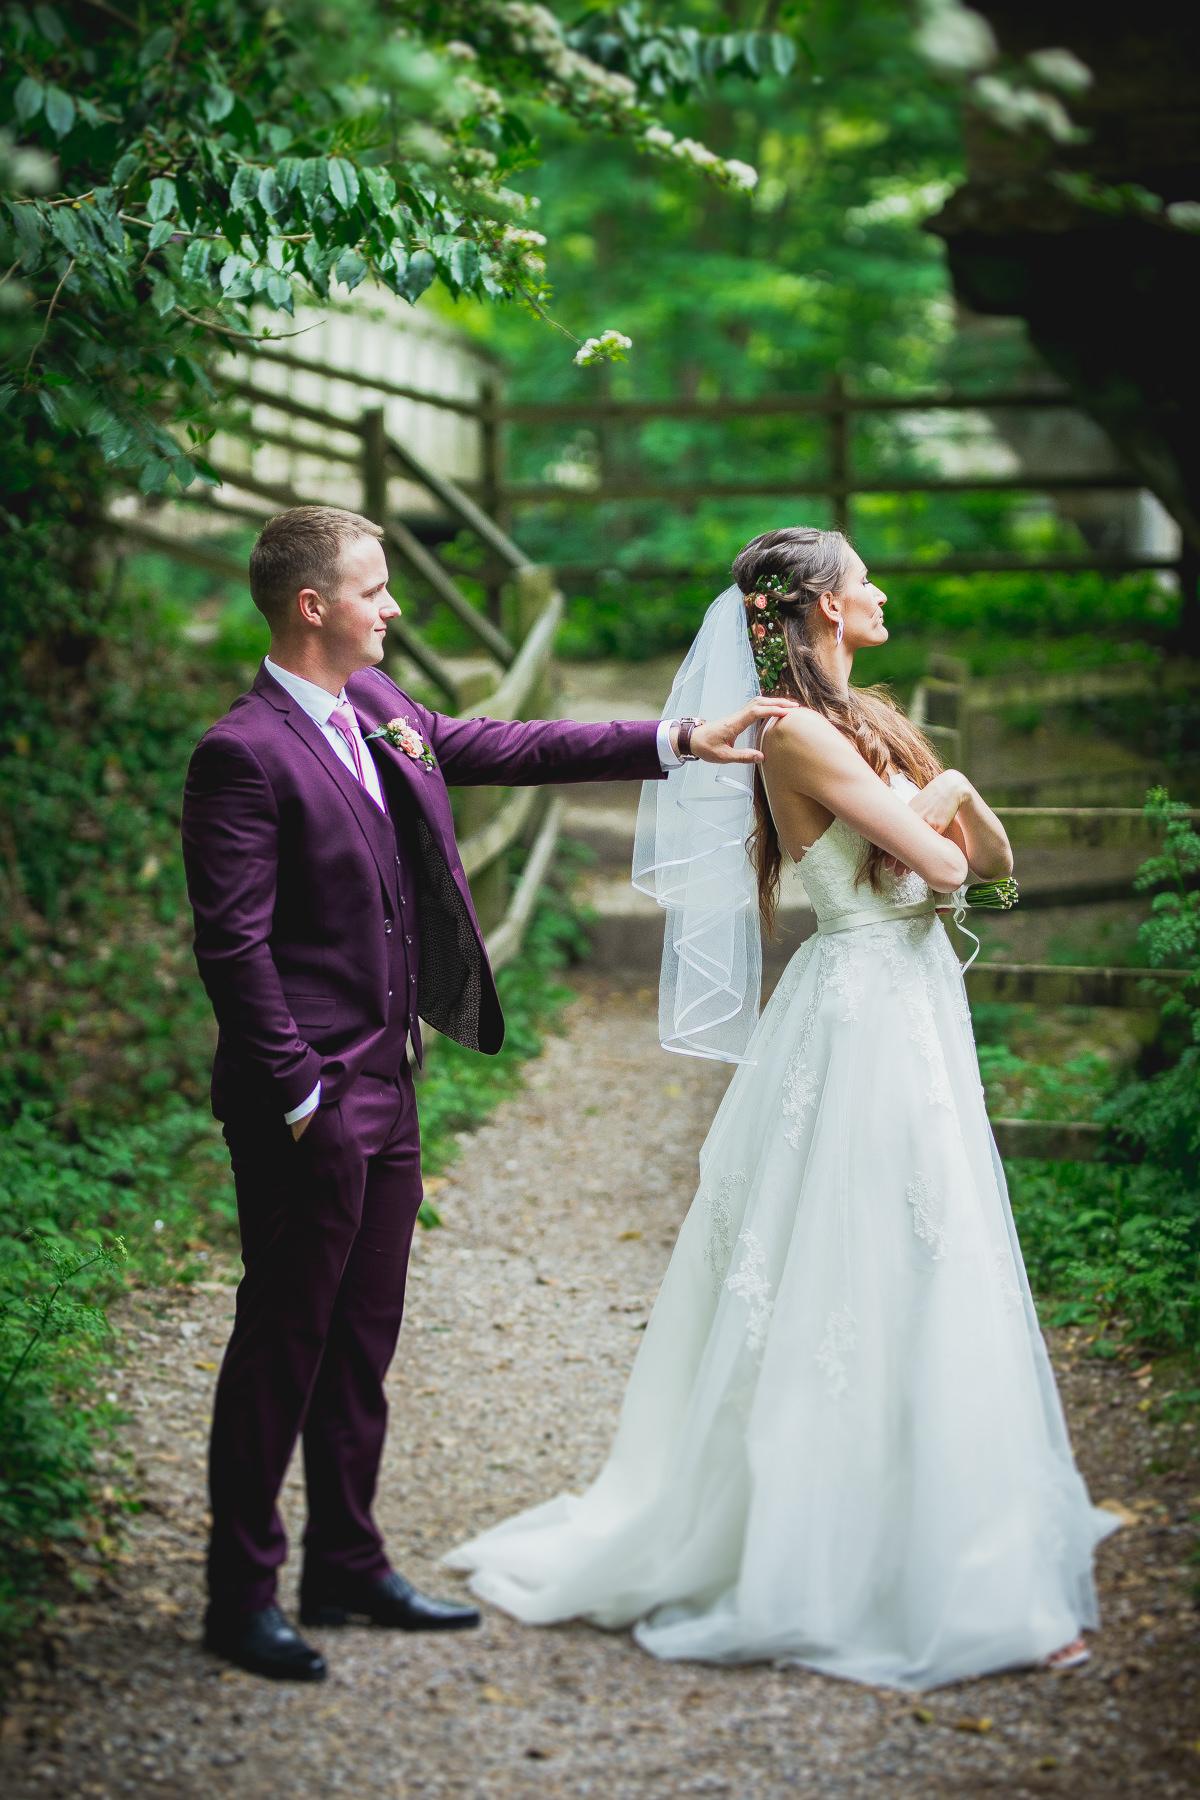 Dangira & Ignas Arundel Sussex Weddings 4.jpg